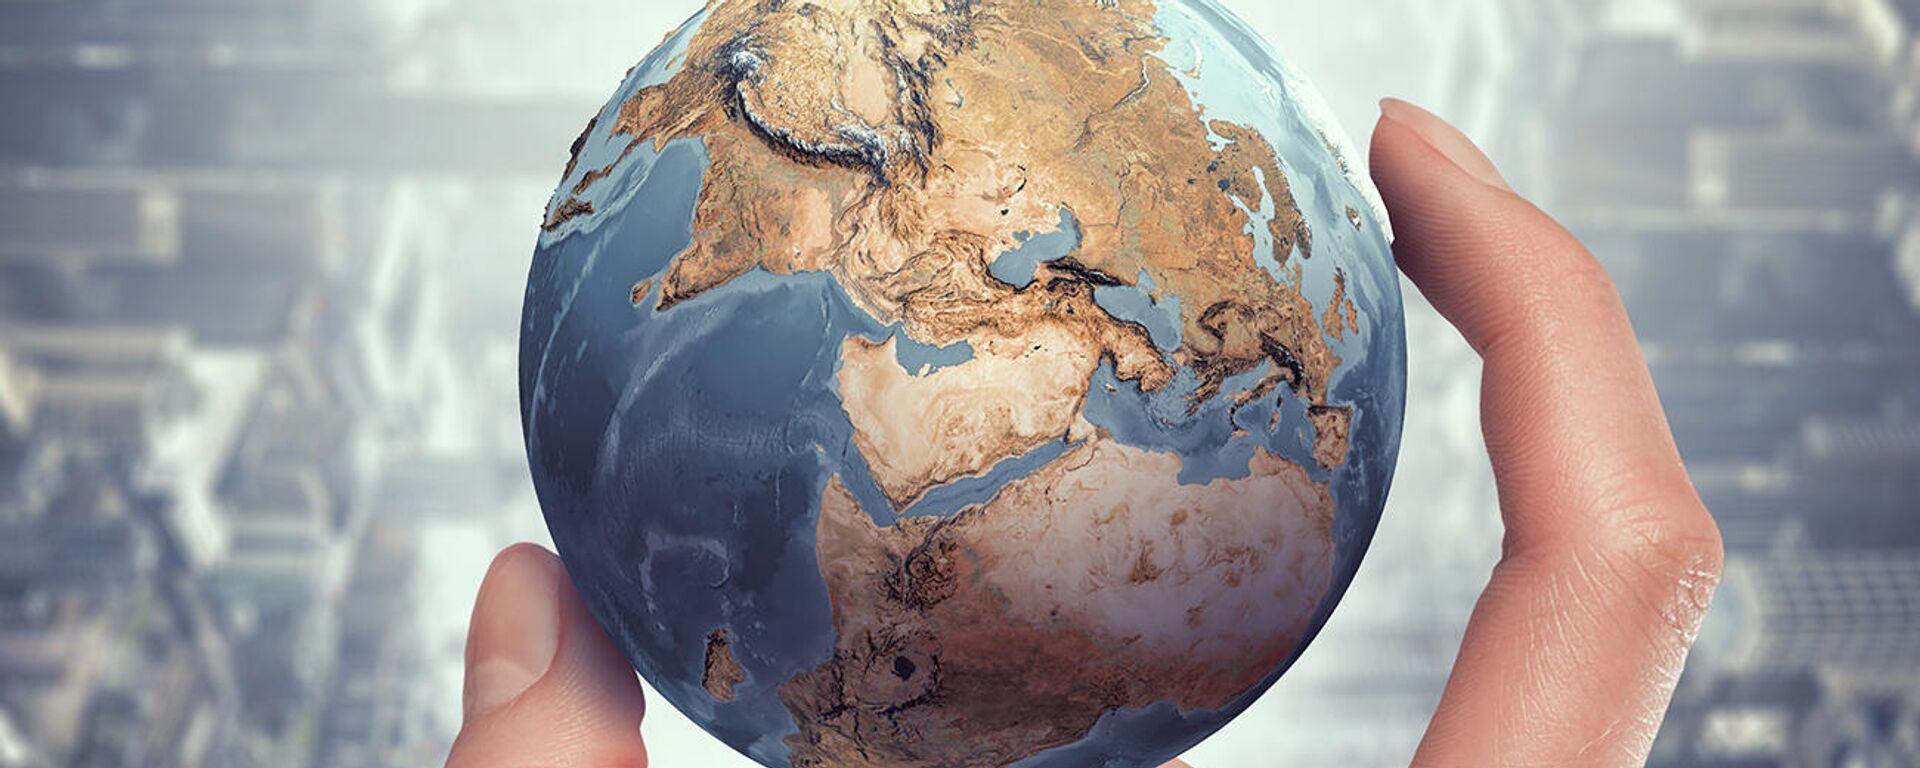 Haití: clamor popular pide la salida de Moise del poder - Sputnik Mundo, 1920, 03.02.2021